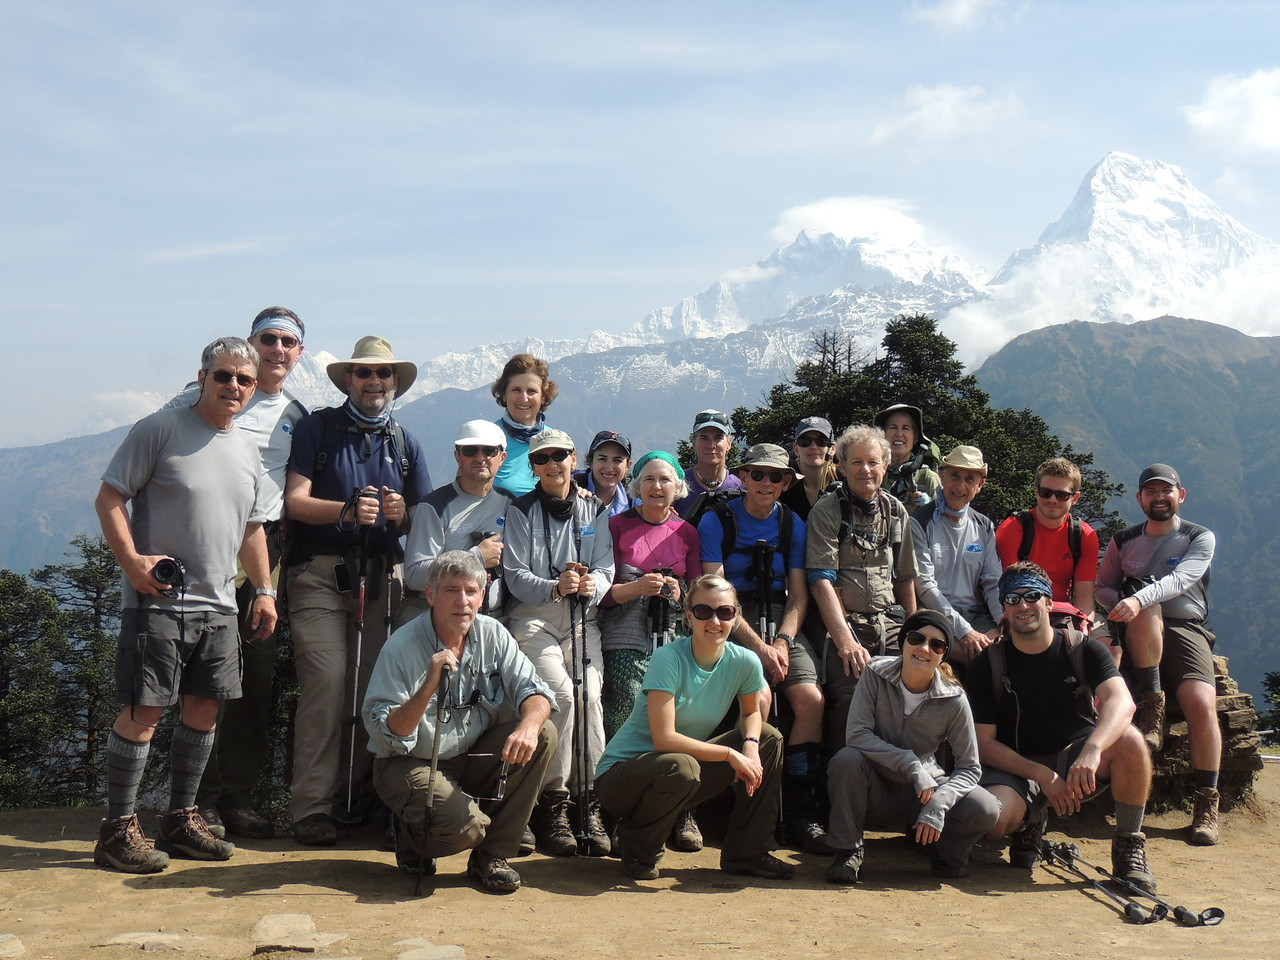 Princeton trekkers on Annapurna circuit - Rick Curtis '79